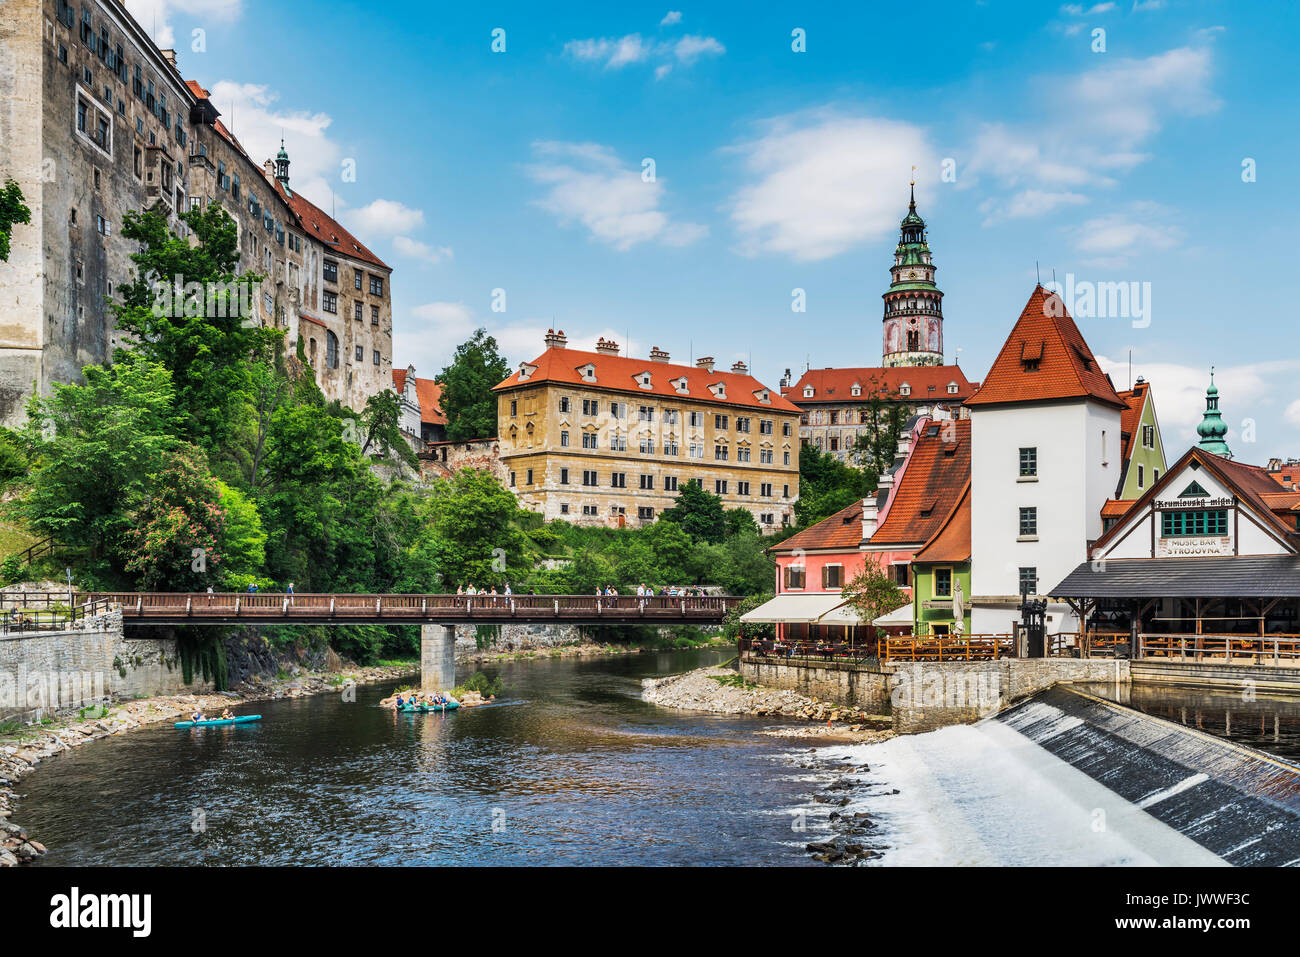 View of the old town of Chesky Krumlov, the Castle Chesky Krumlov and the River Vltava in Bohemia, Jihocesky Kraj, Czech Republic, Europe - Stock Image